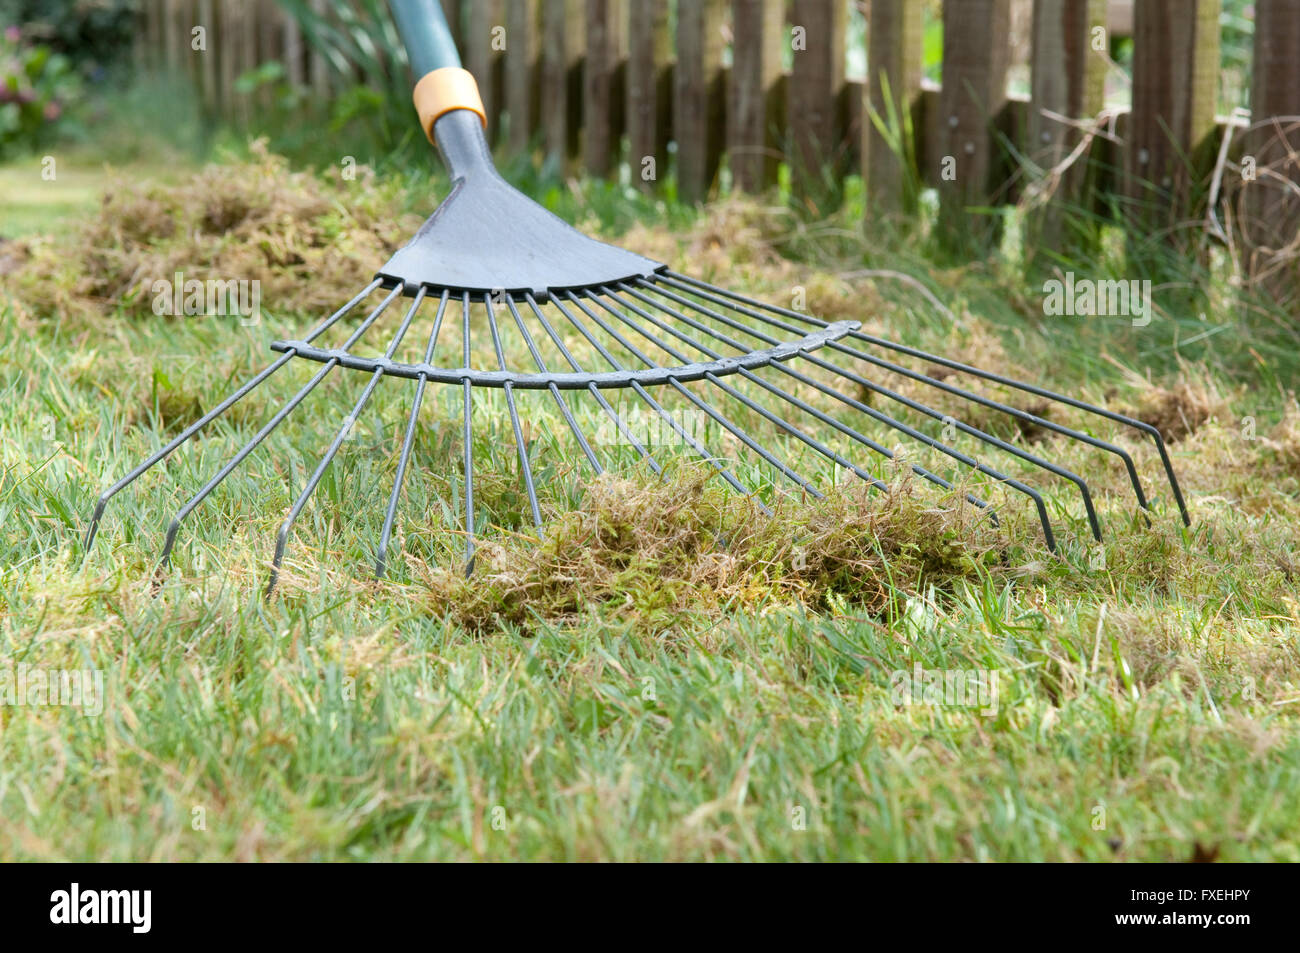 Vertikutieren Garten Rasen Moos Mit Laubbesen Entfernen Stockfoto